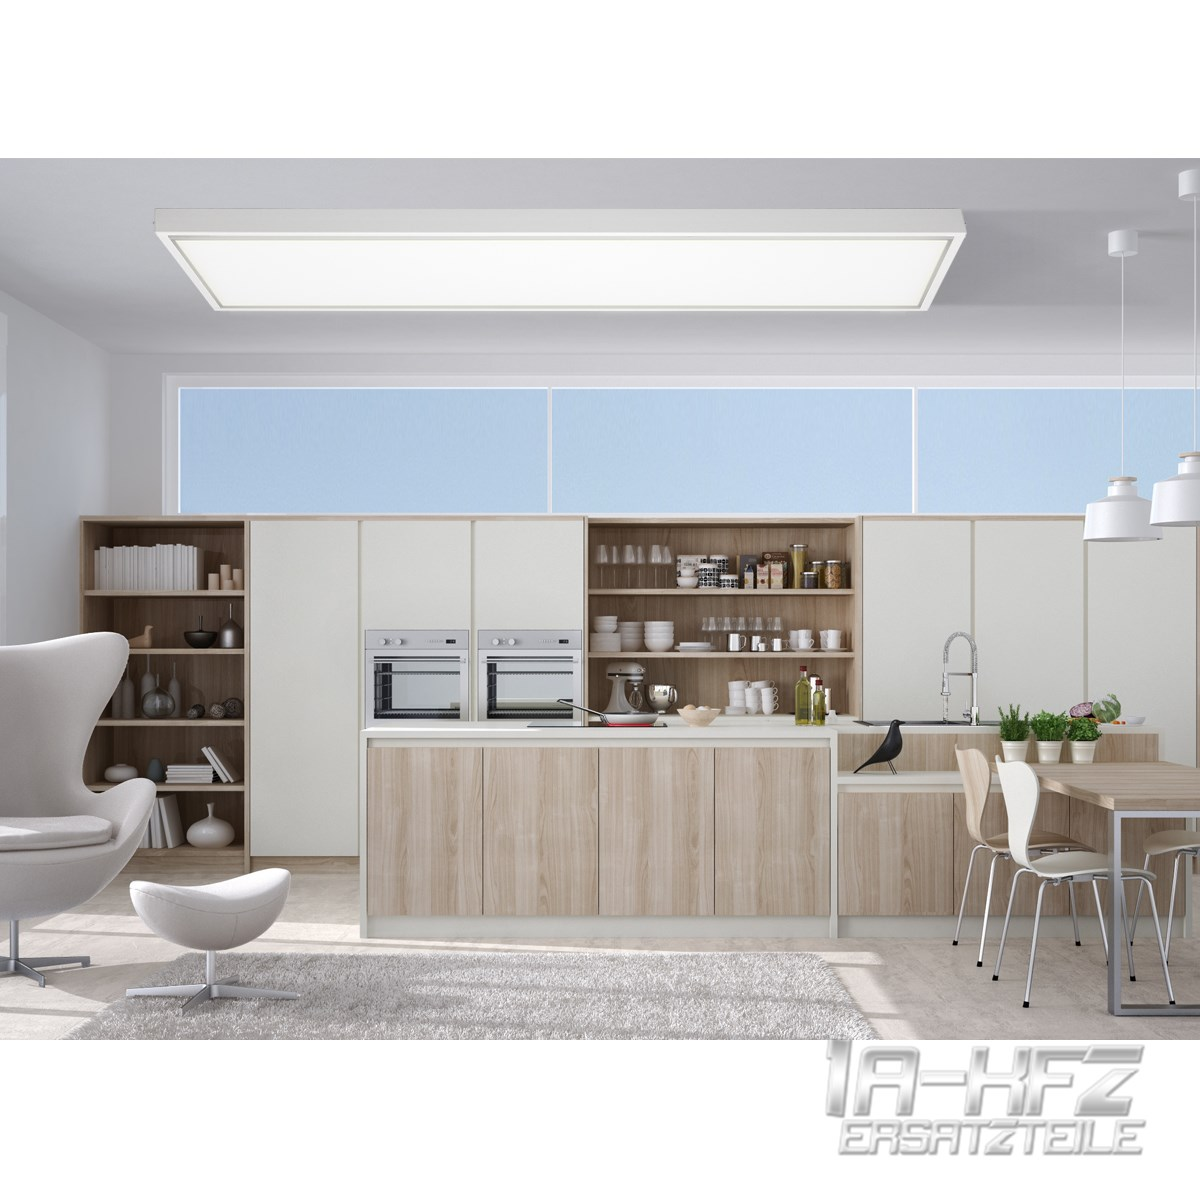 led panel rahmen deckenaufbau 30x30 60x30 60x60 120x30 cm. Black Bedroom Furniture Sets. Home Design Ideas